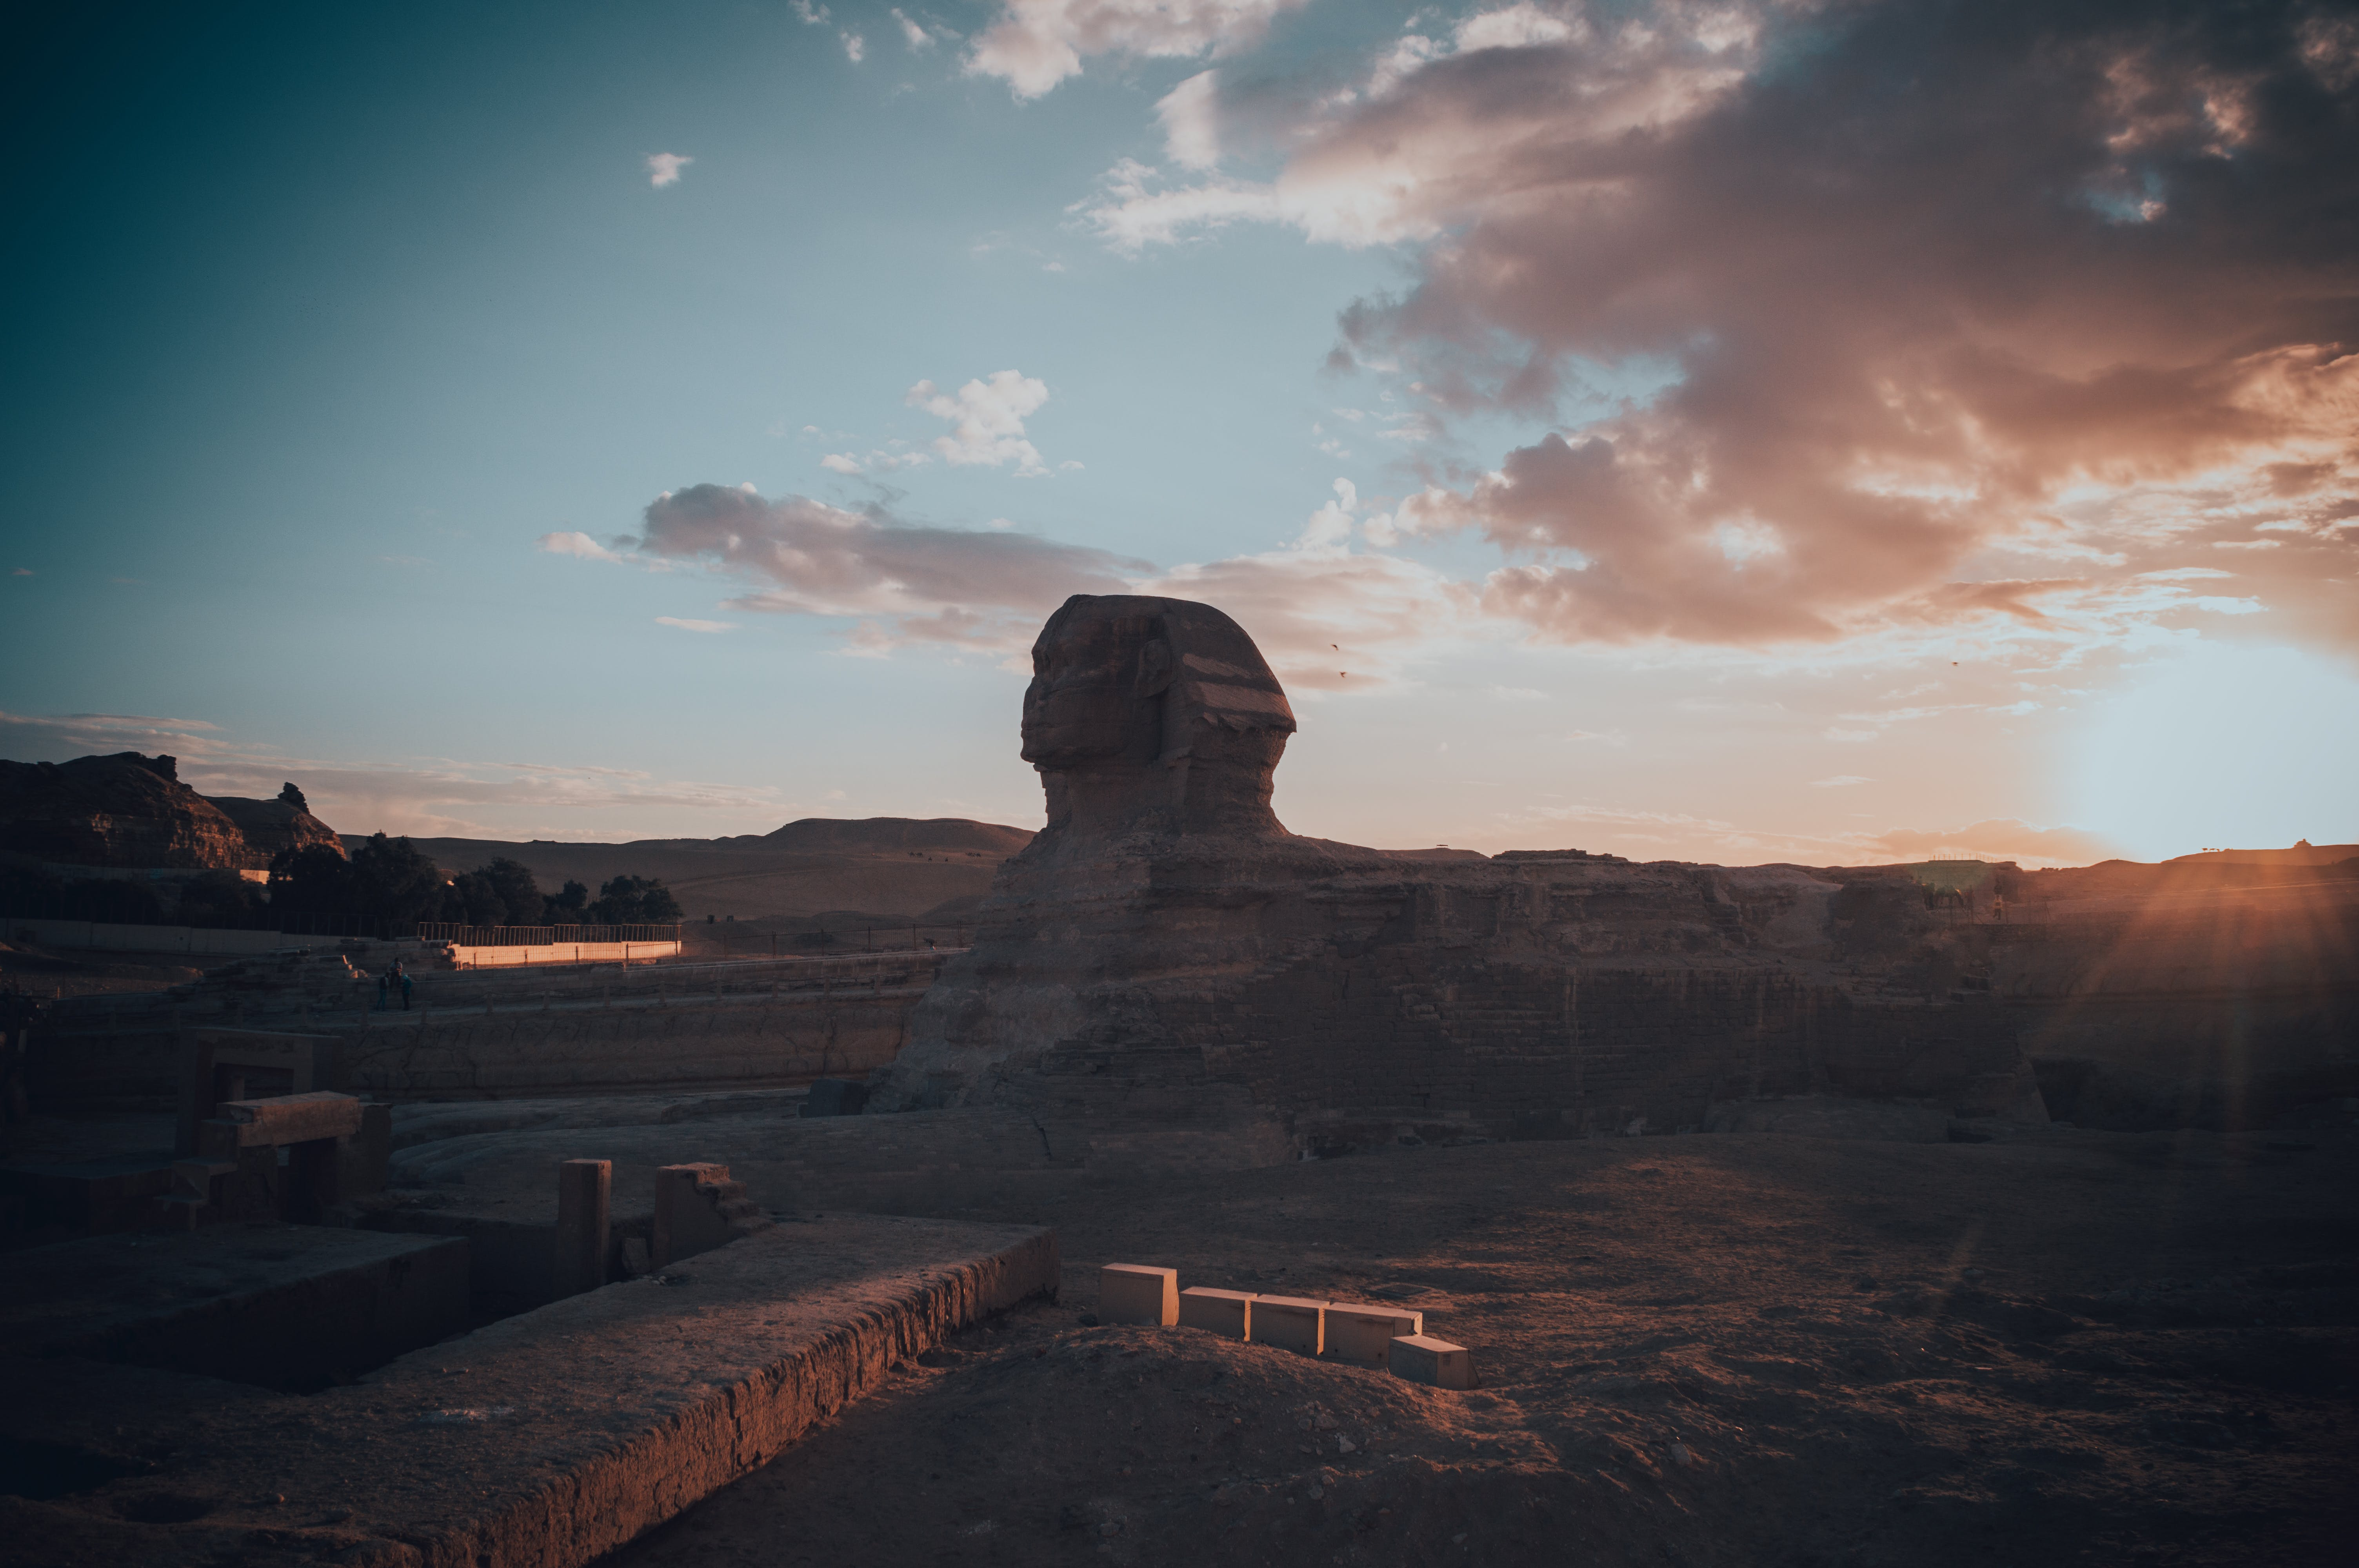 Kostenloses Stock Foto zu abend, Ägypten, berg, blaue himmel